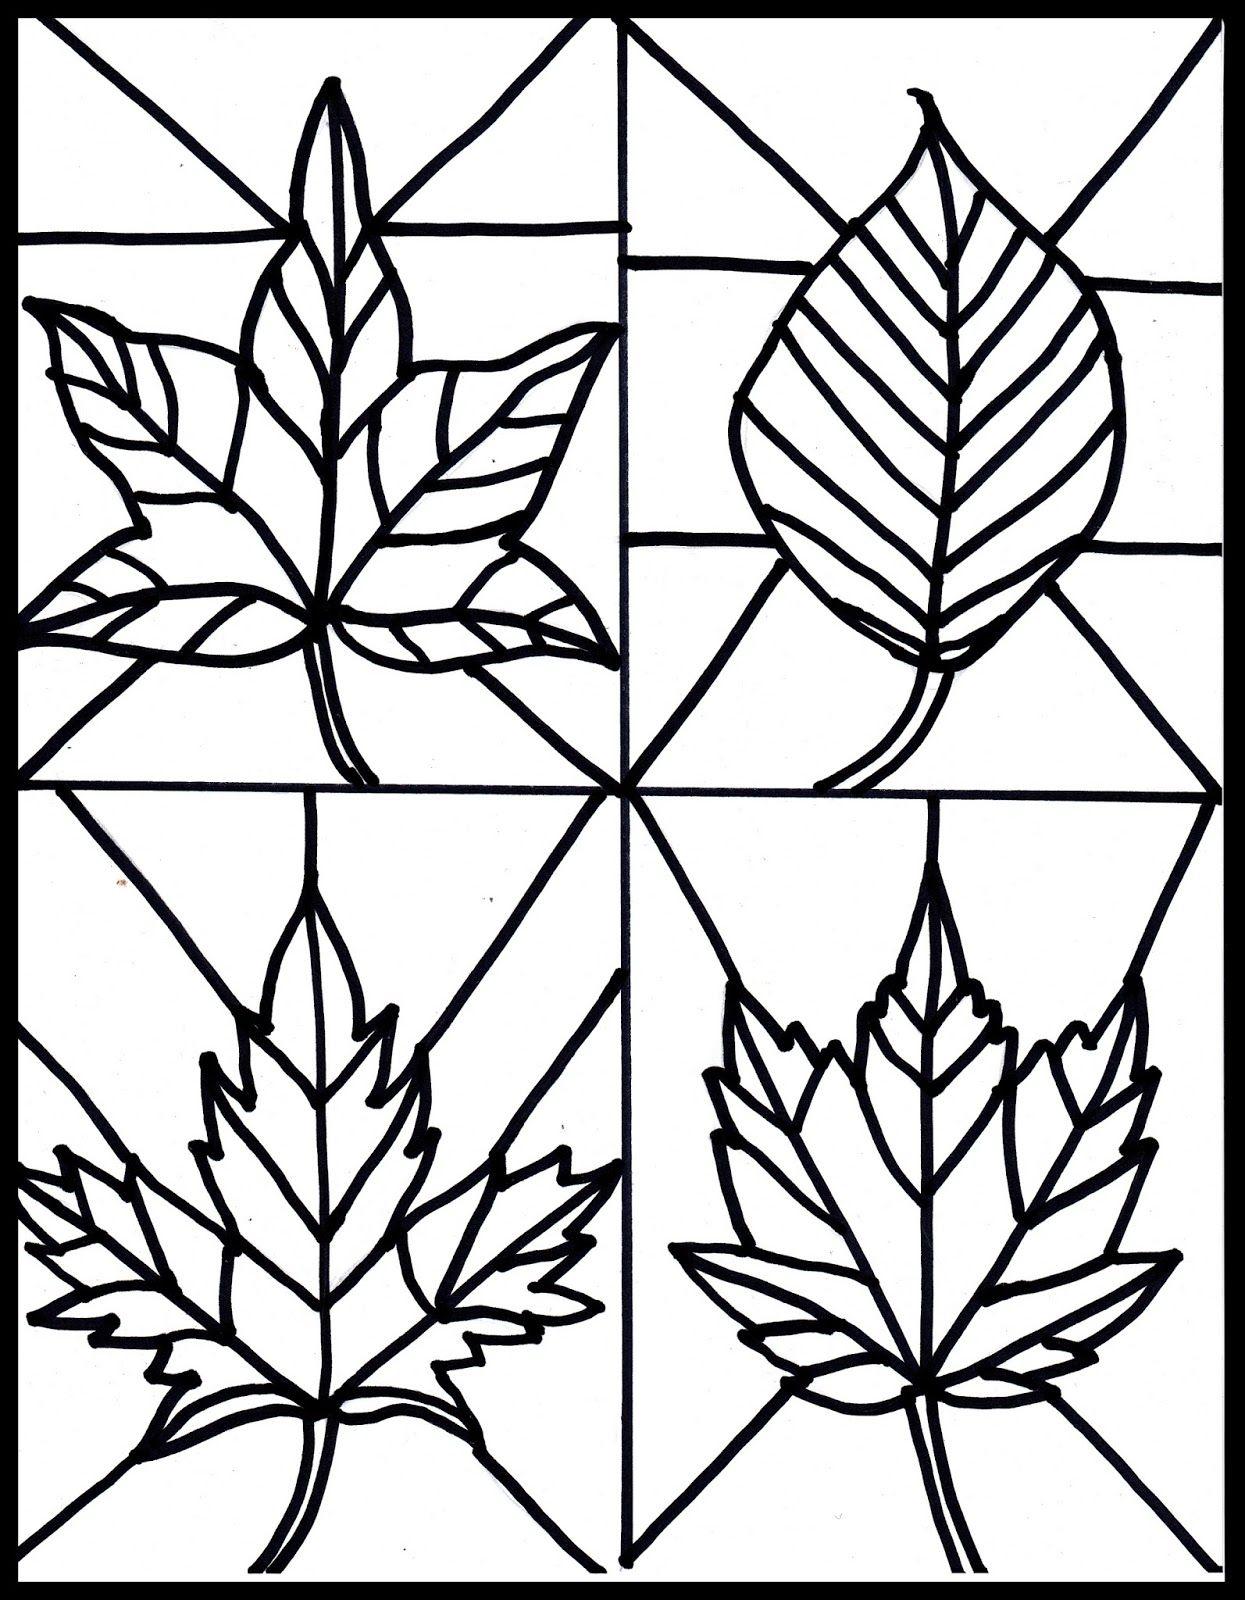 hojas de otoño para pintar | Actividades de plàstica | Pinterest ...